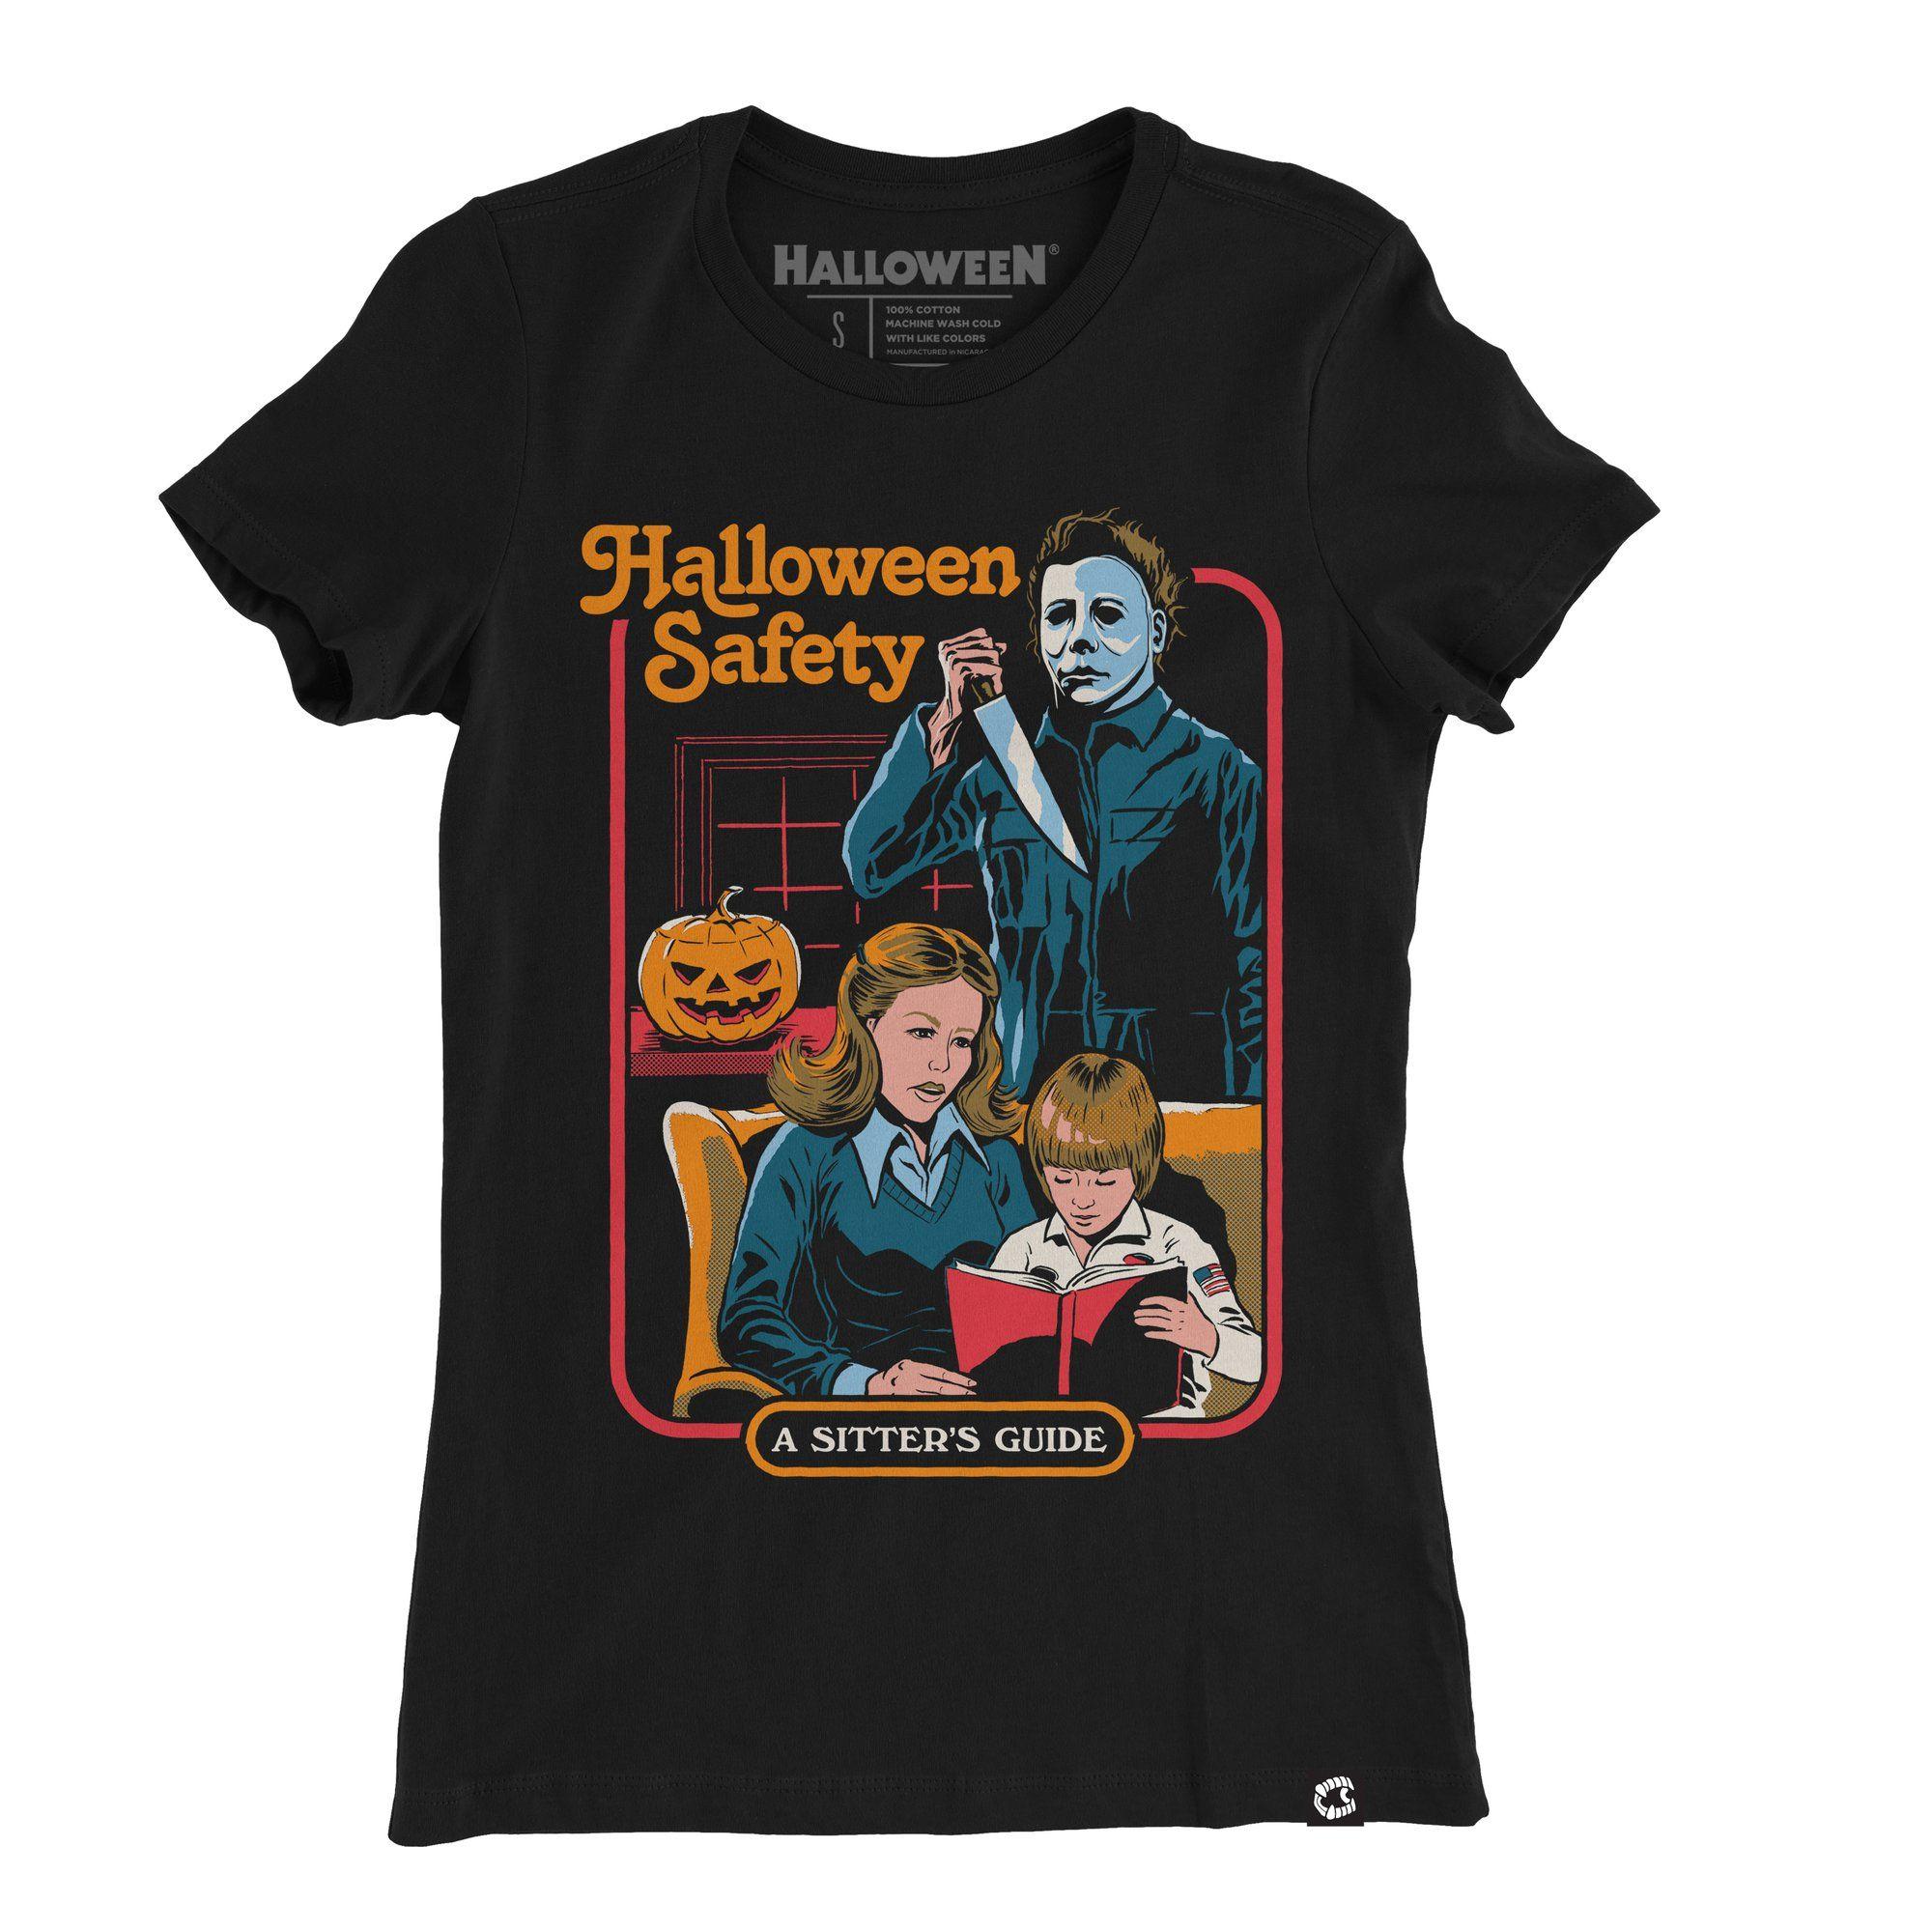 Halloween® Safety Ladies Tee in 2020 Halloween safety